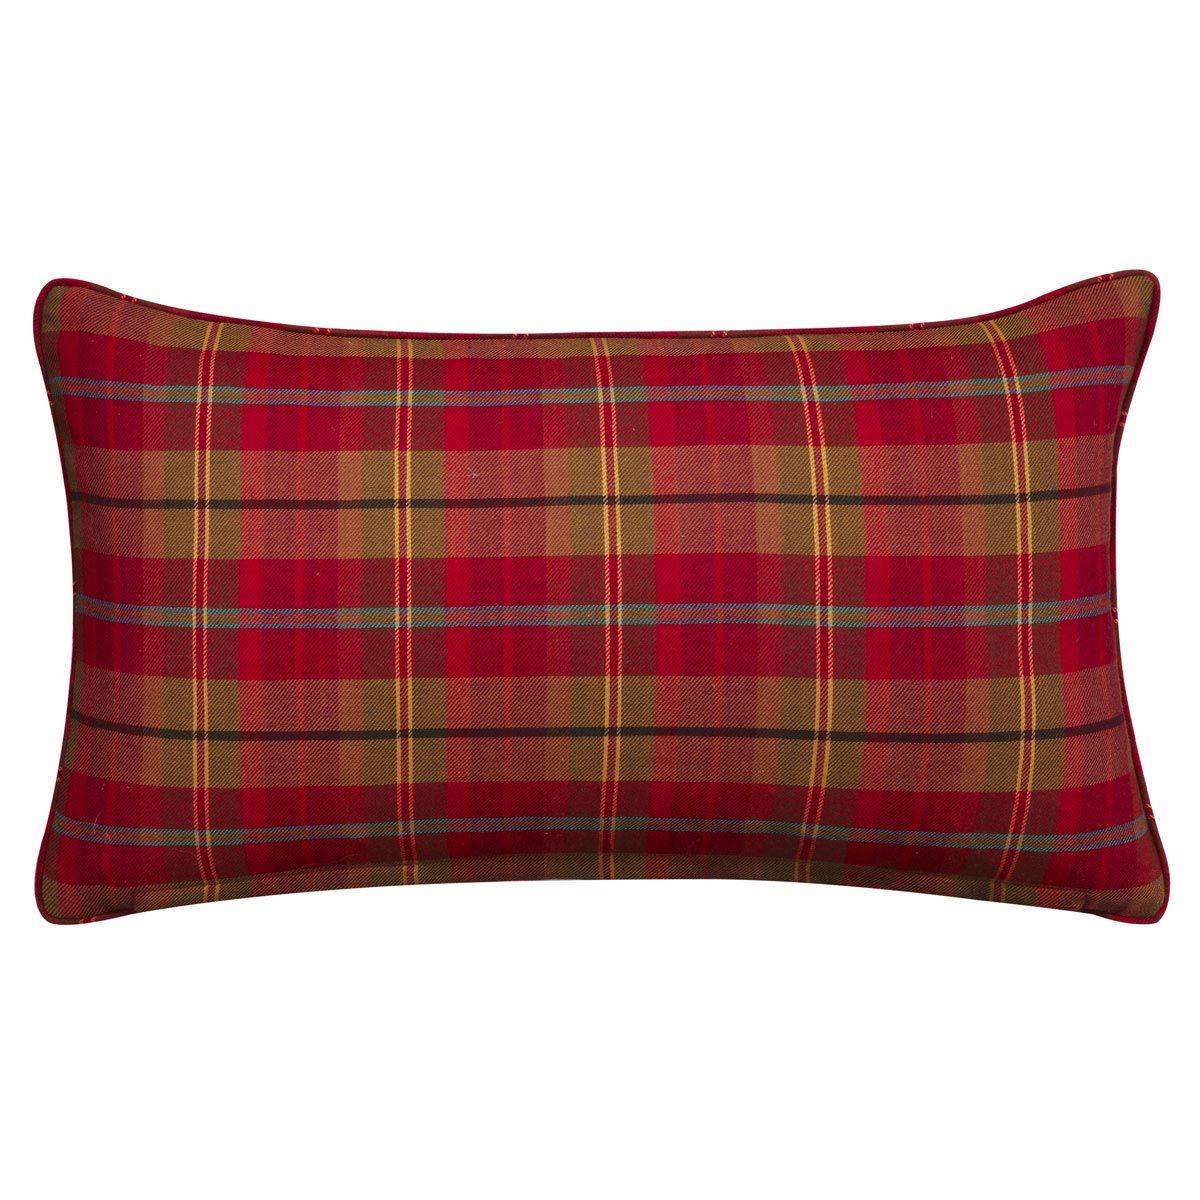 Chair Covers Scotland Doc Mcstuffins Smyths Highland Tartan Cushion Cover Small Highlands